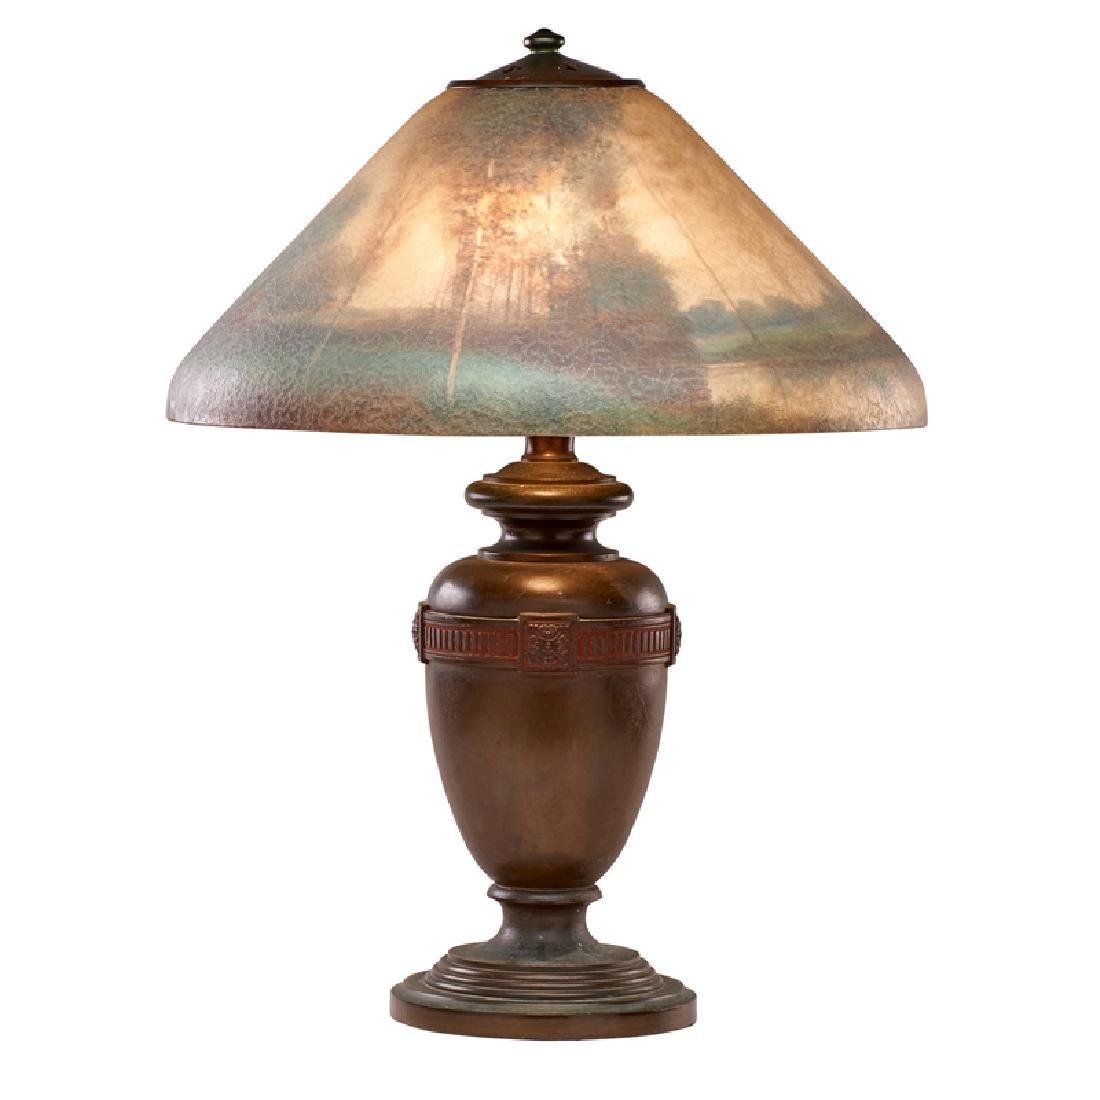 HANDEL Table lamp with lakeland scene